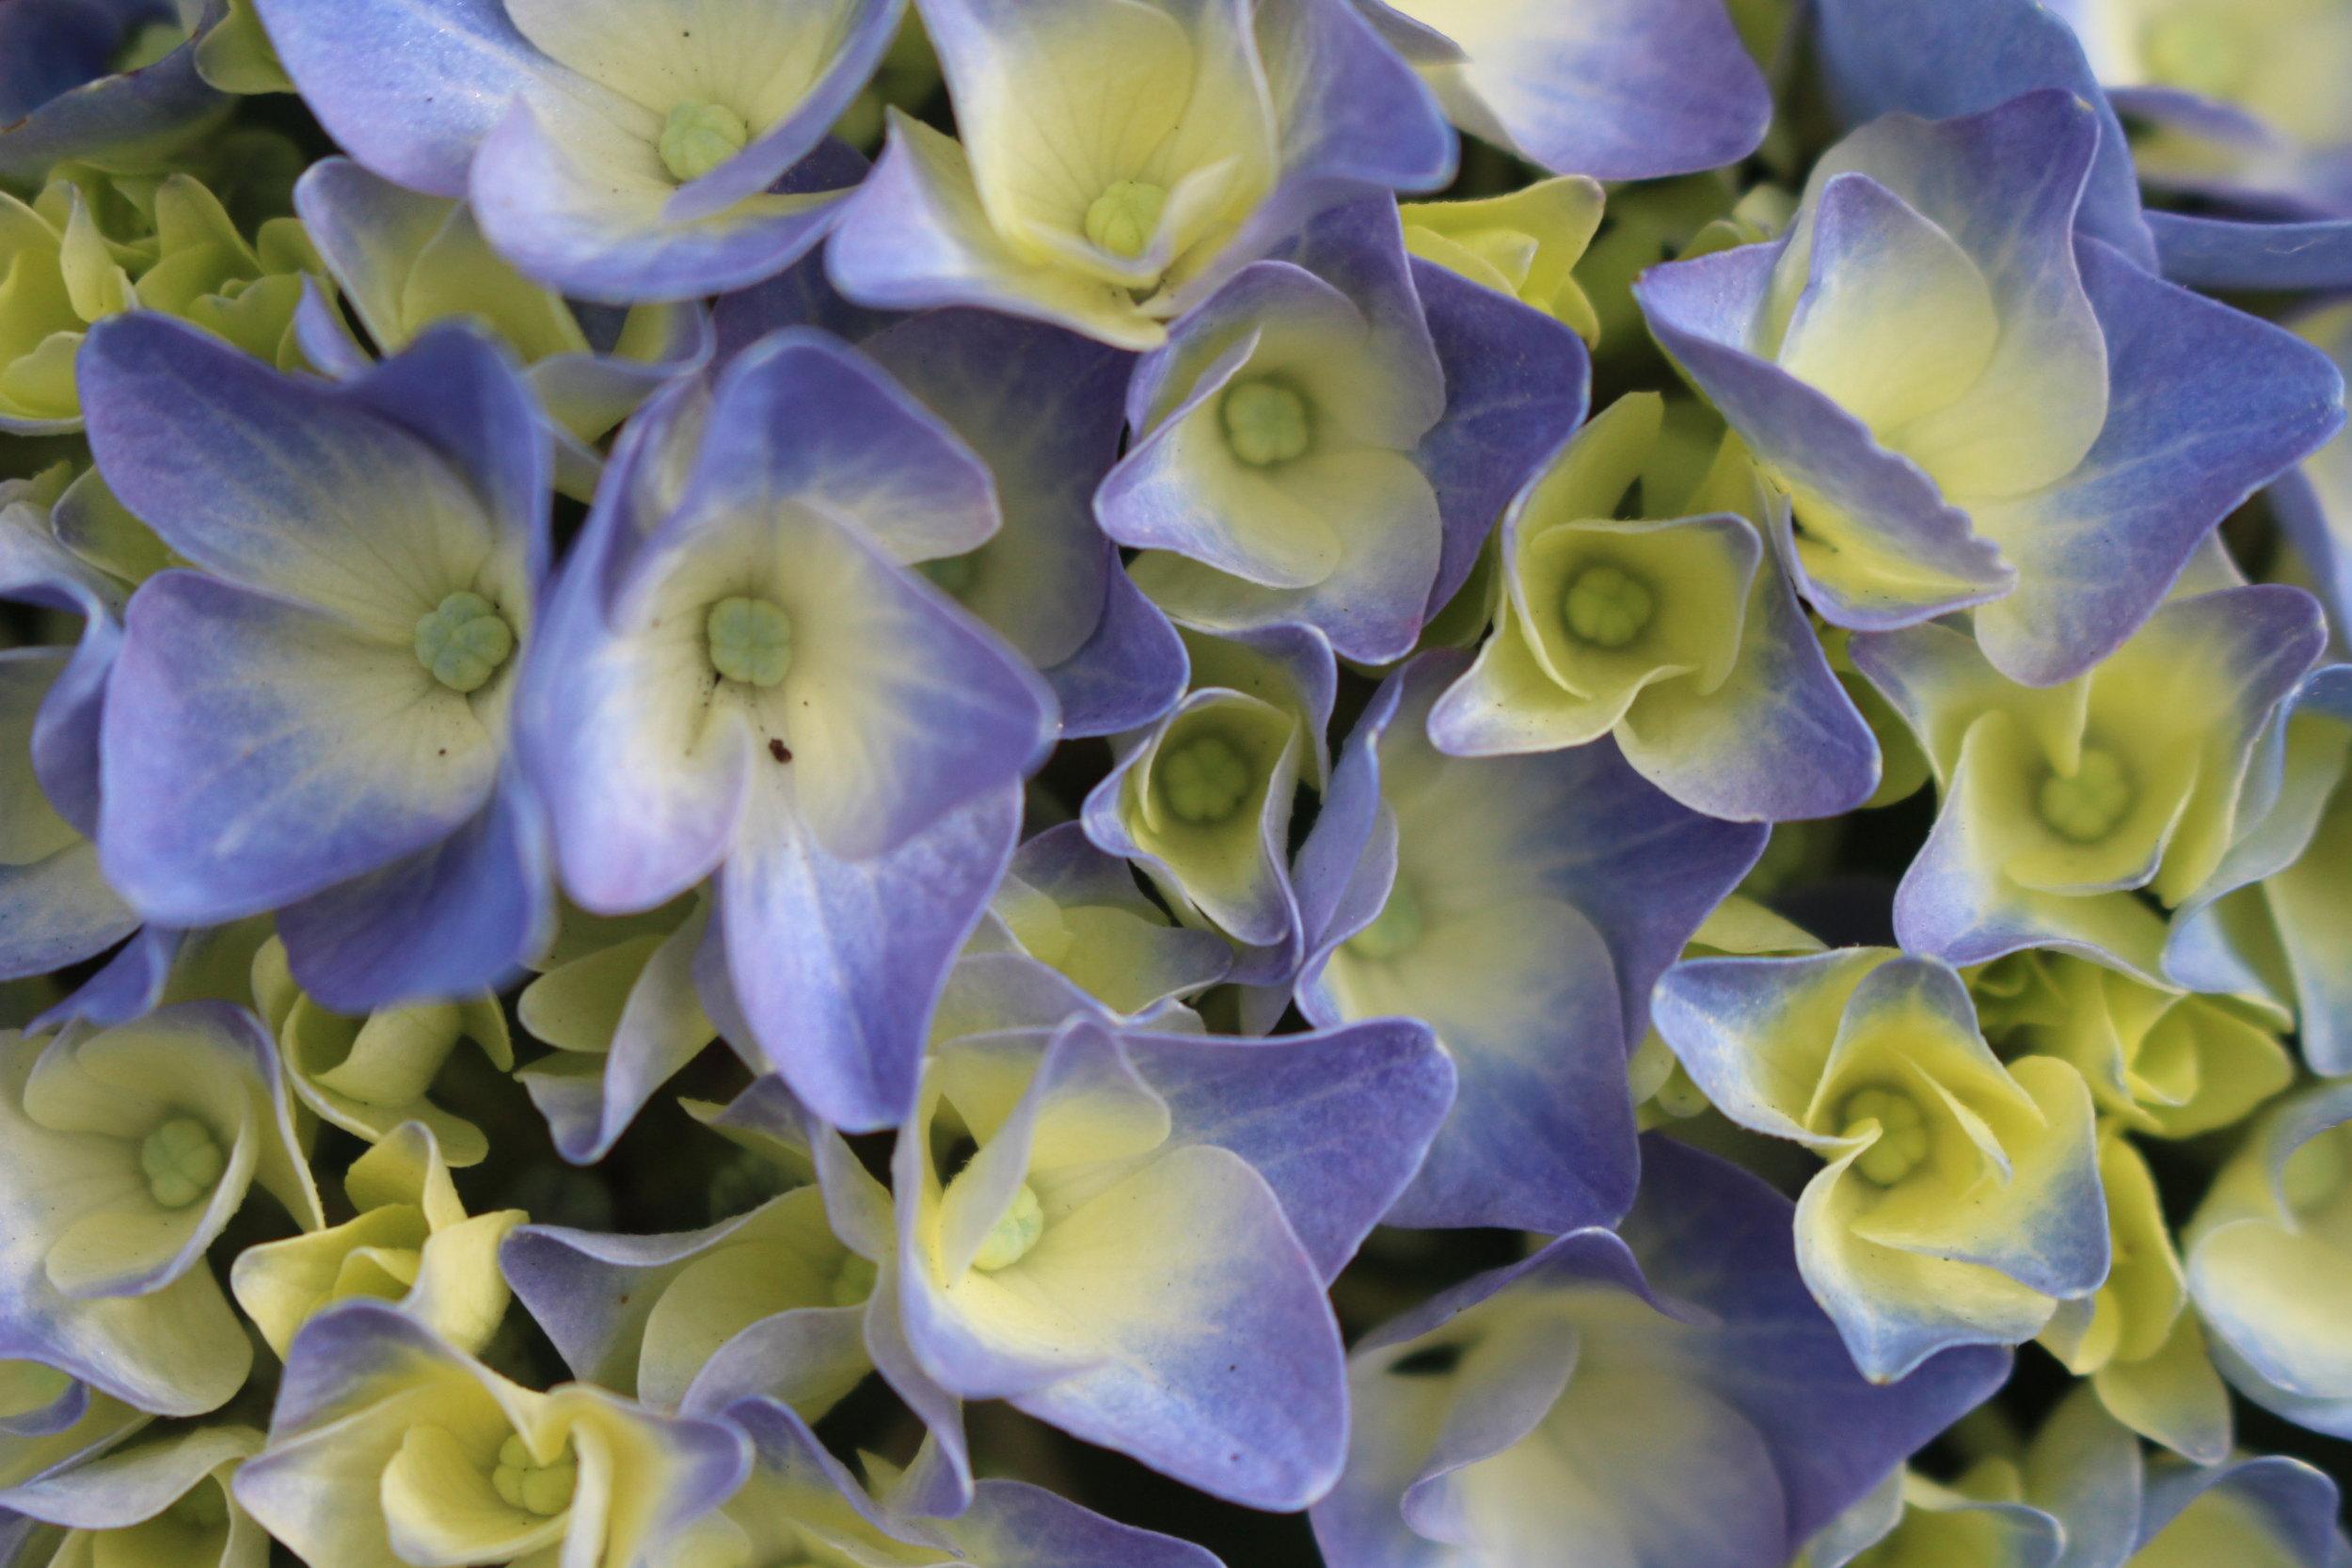 #64 Hydrangea, Hydrangea macrophylla